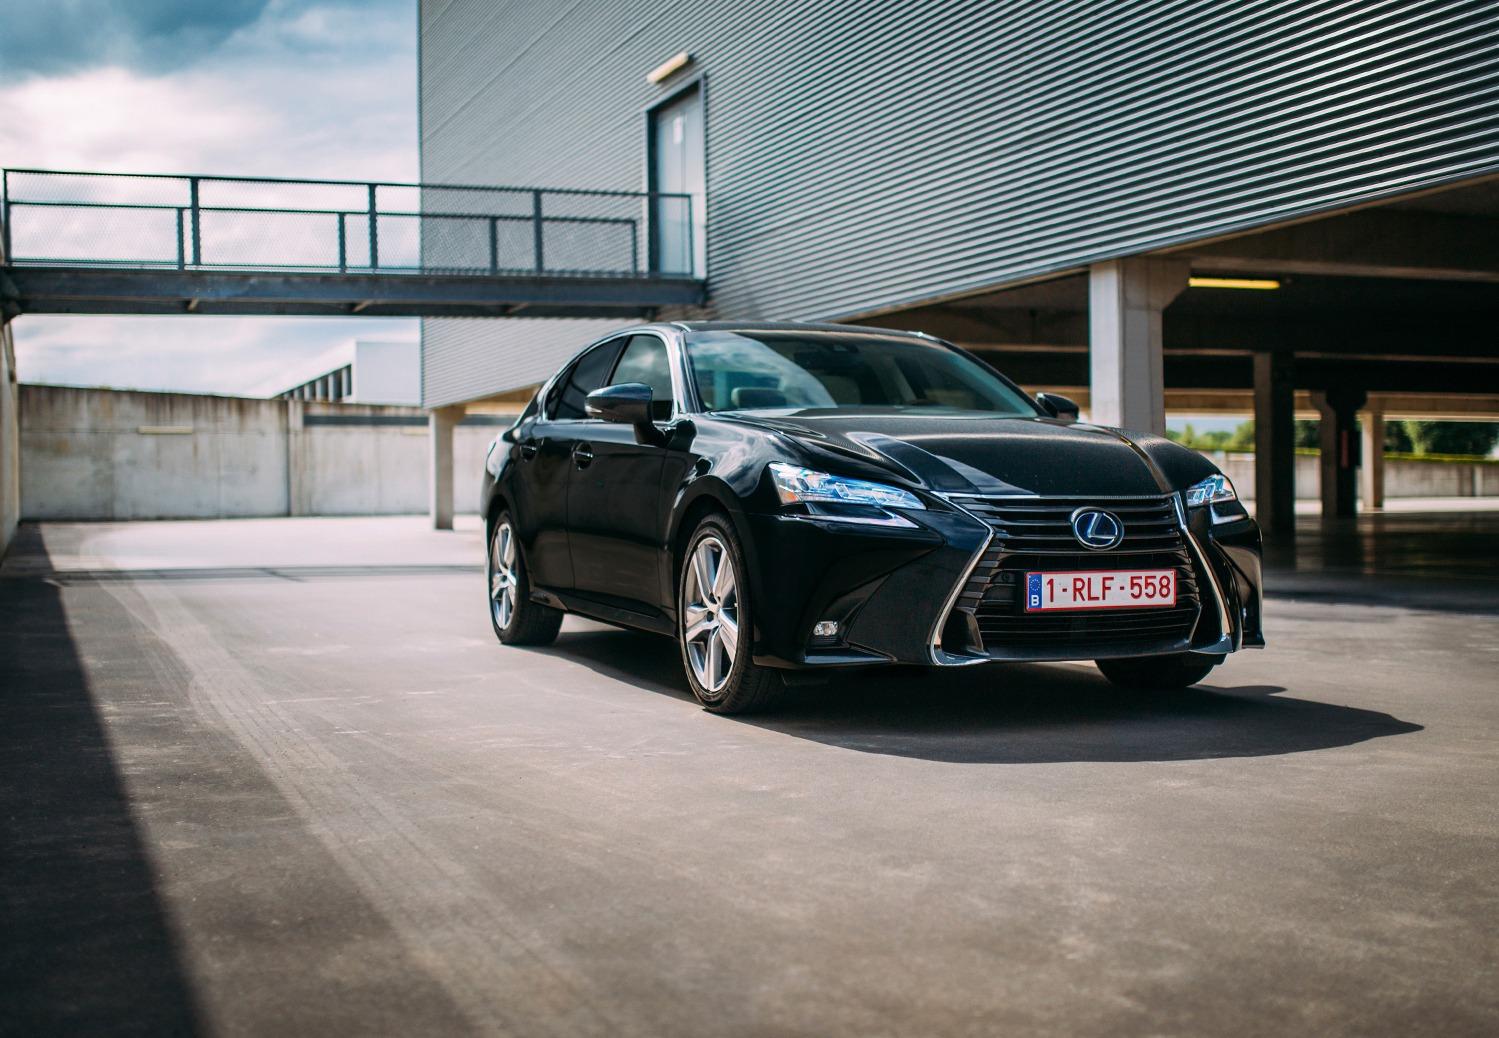 Rijtest: Lexus GS 450h